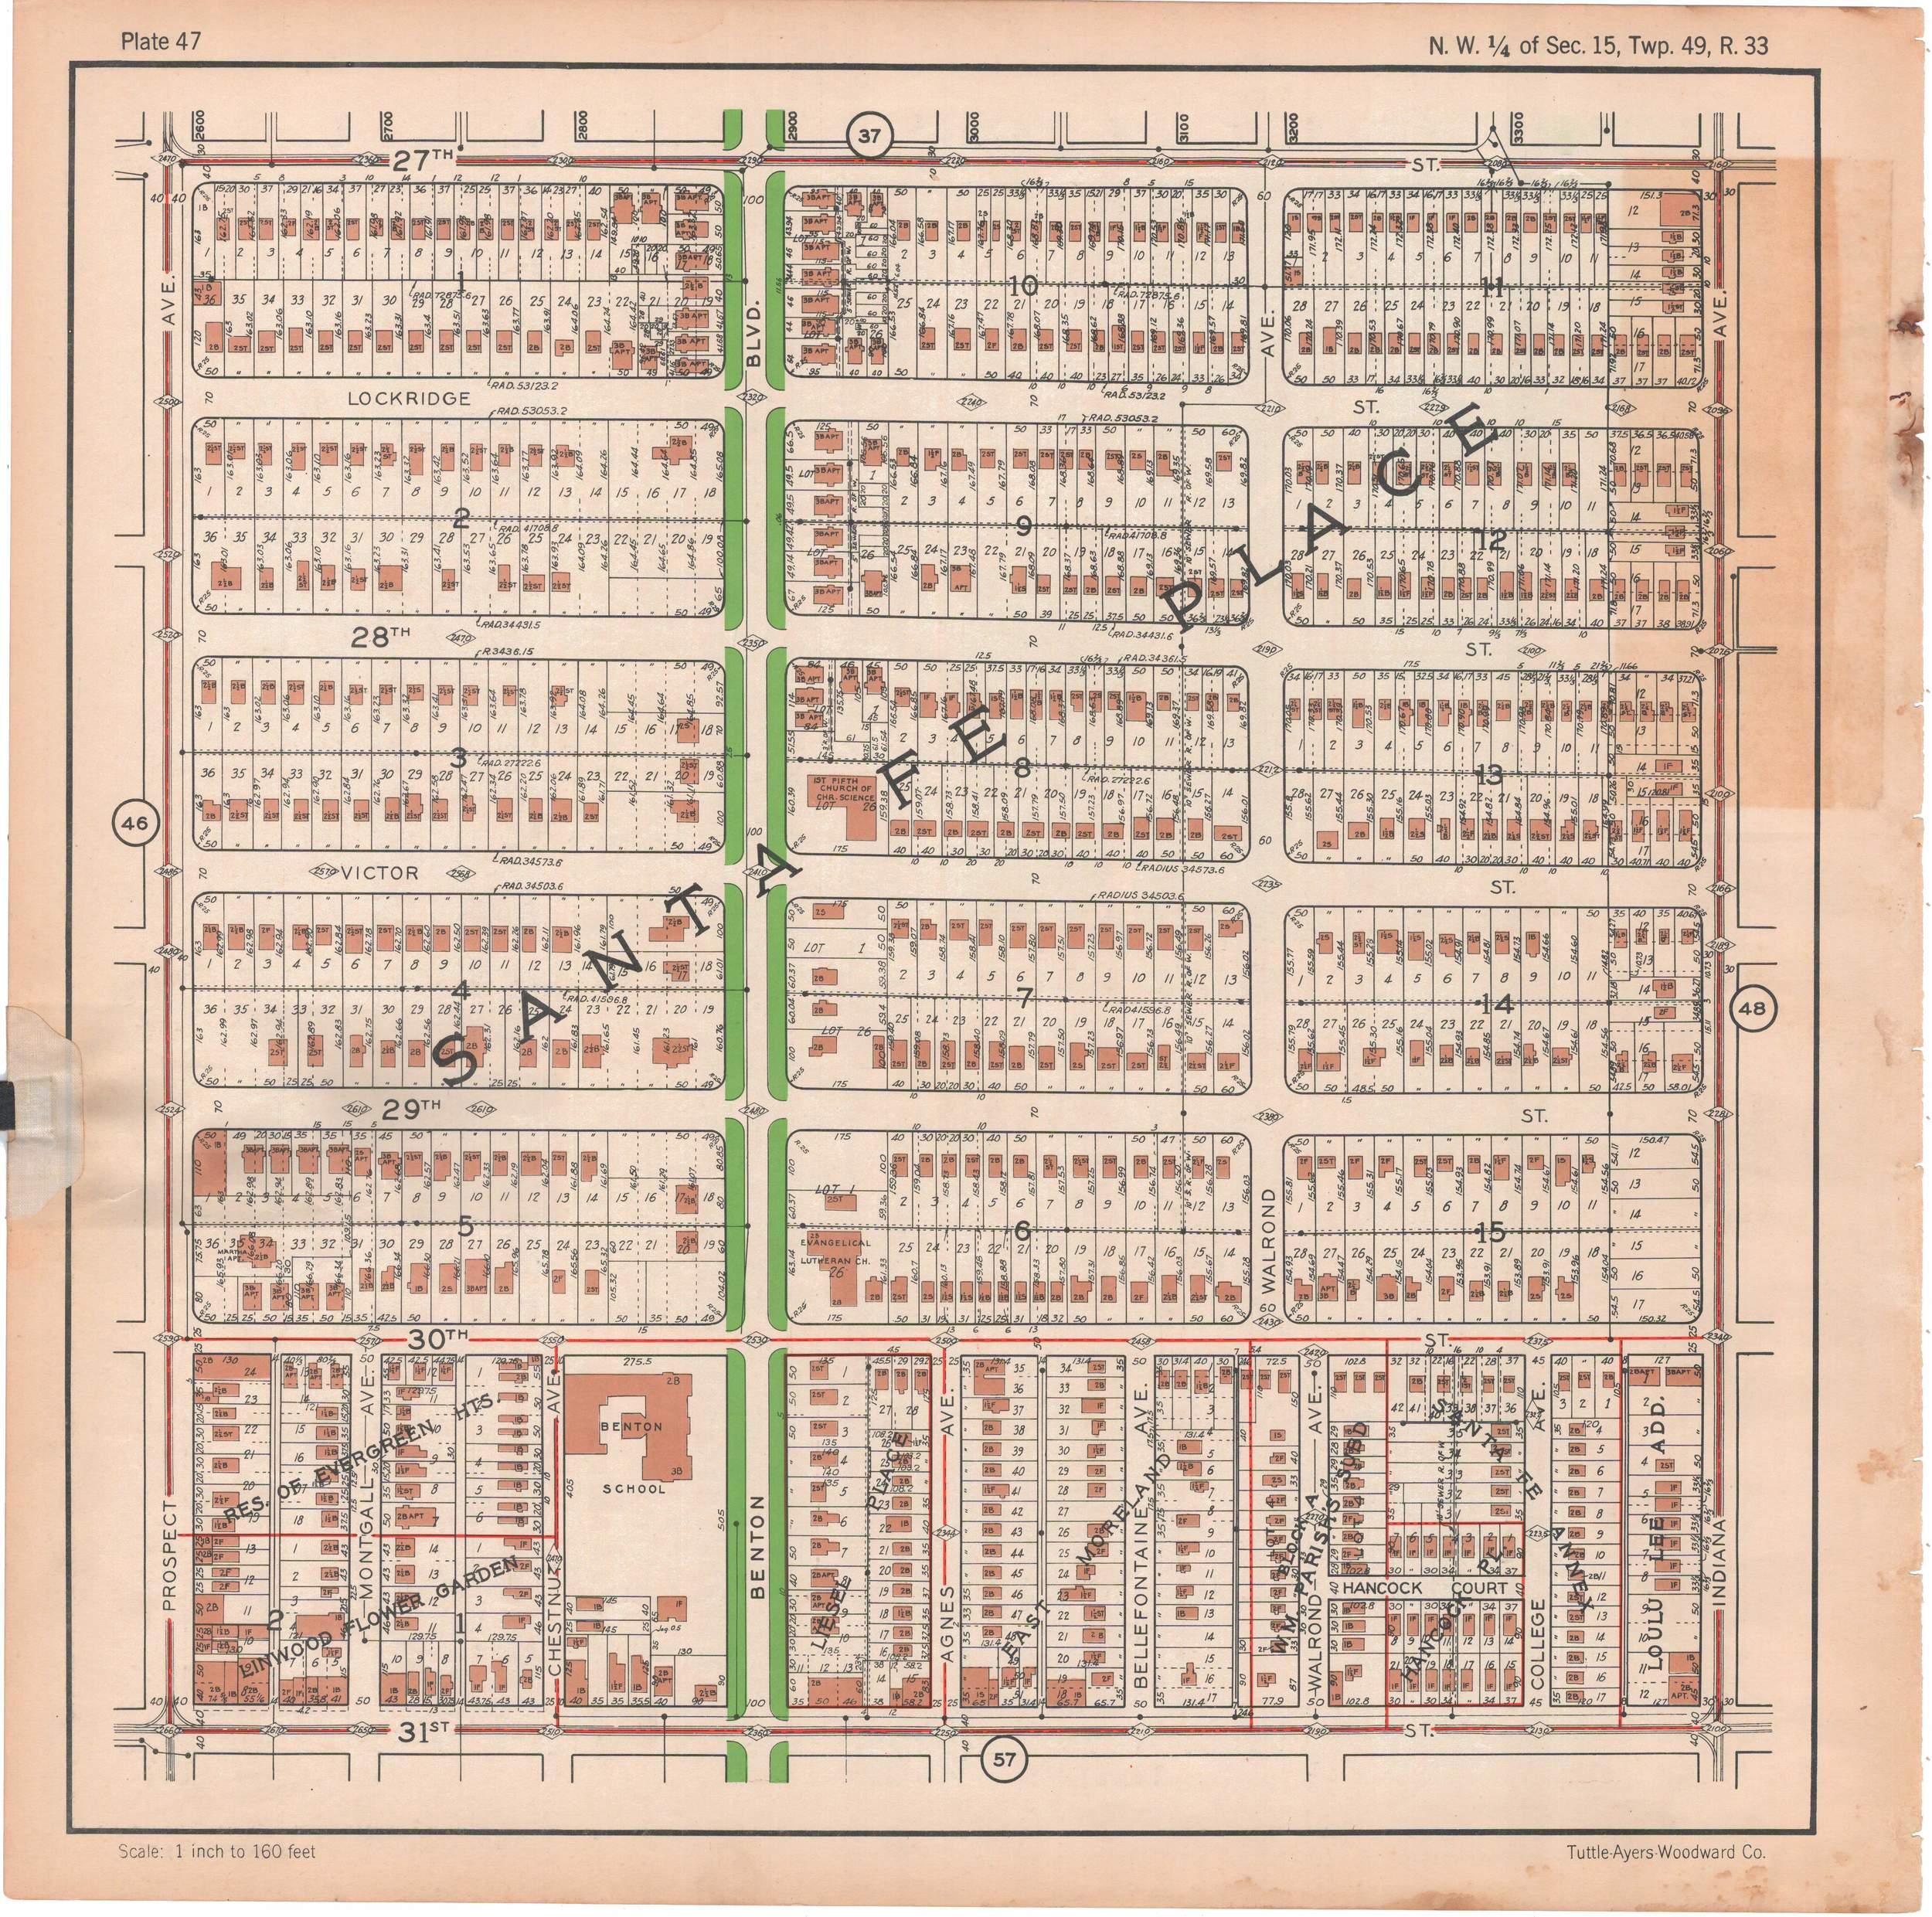 1925 TUTTLE_AYERS_Plate 47.JPG